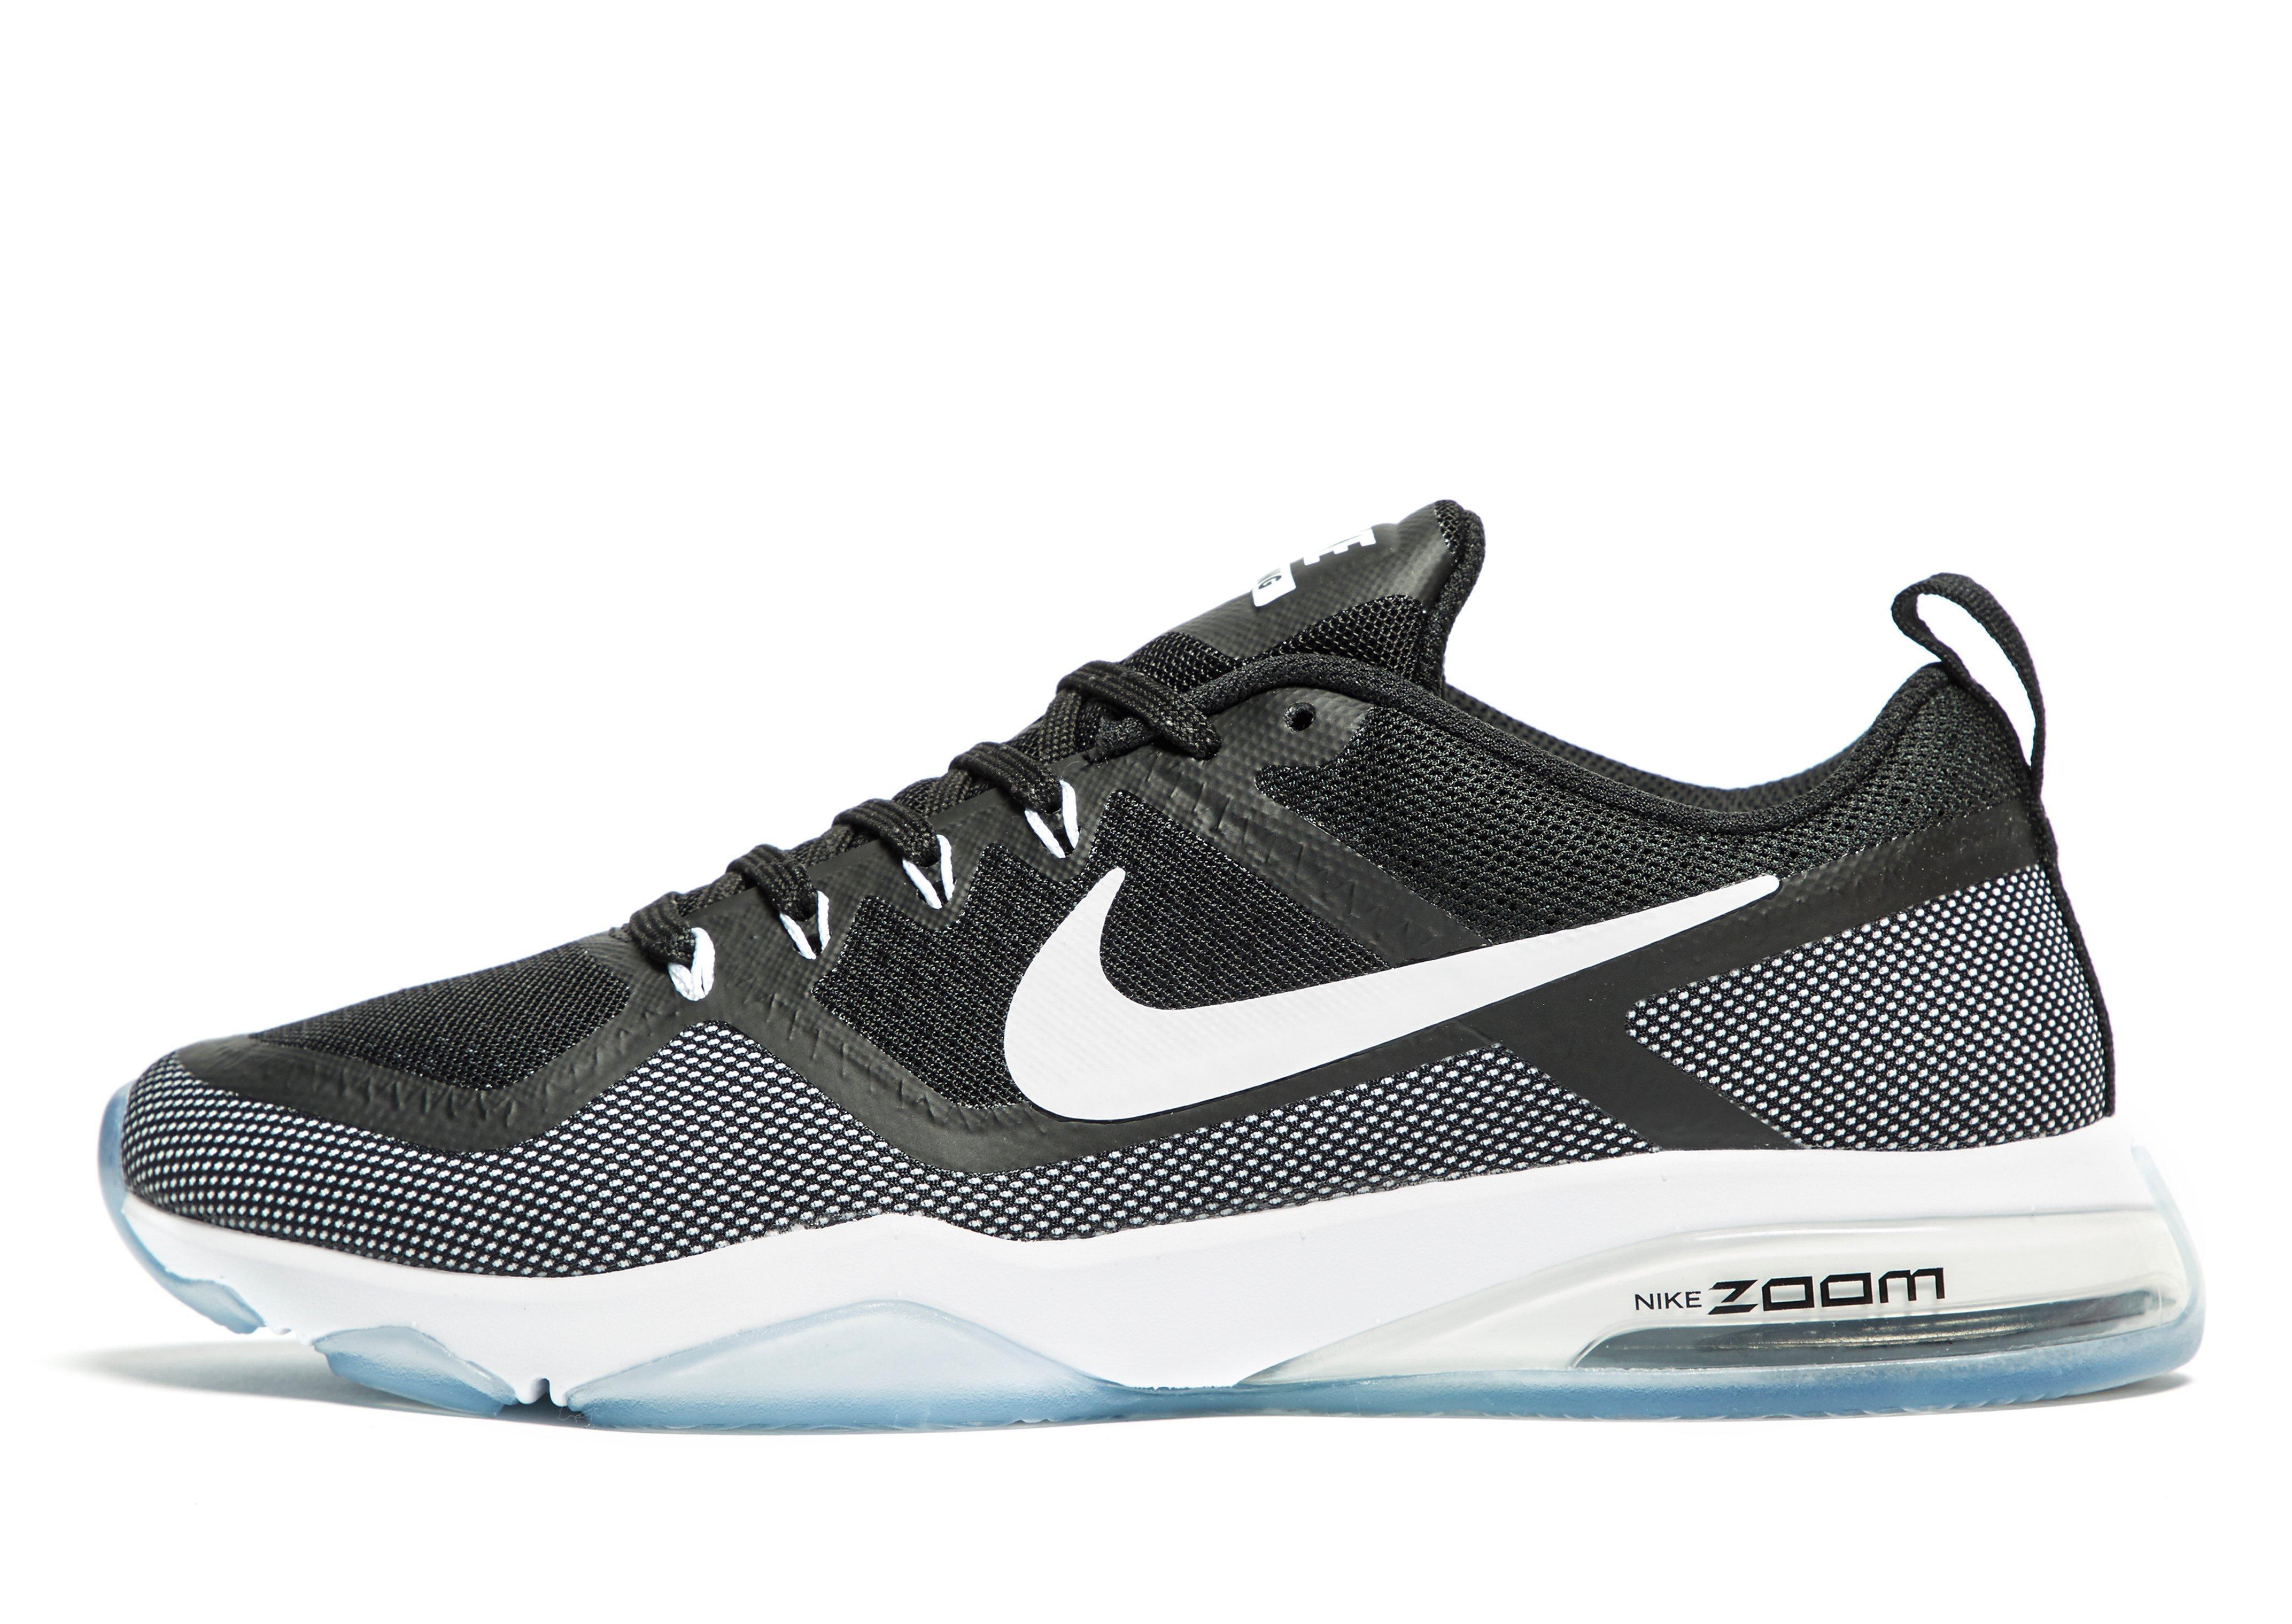 fdcd1d9787b0 Nike Zoom Fitness in Black for Men - Lyst